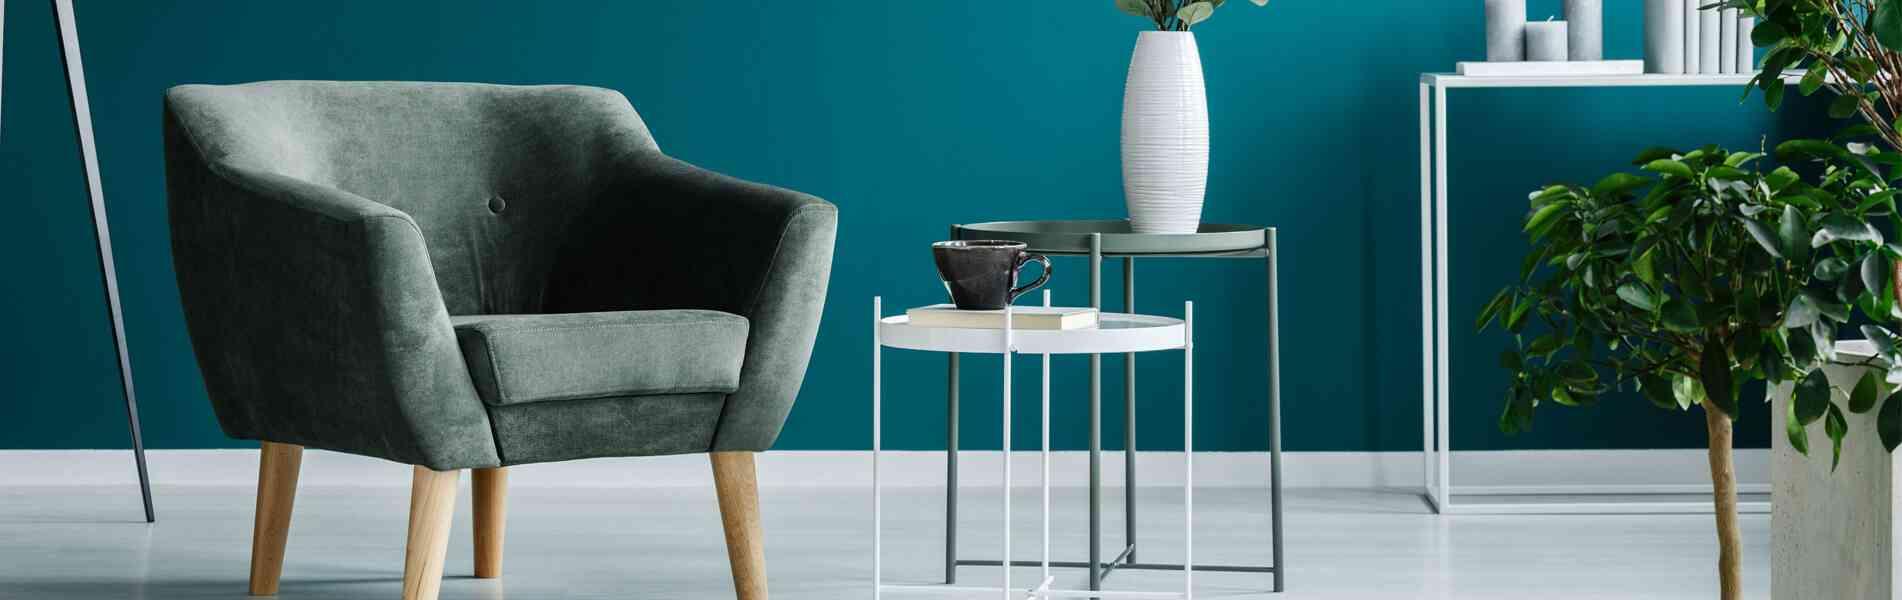 Furniture_Fittings